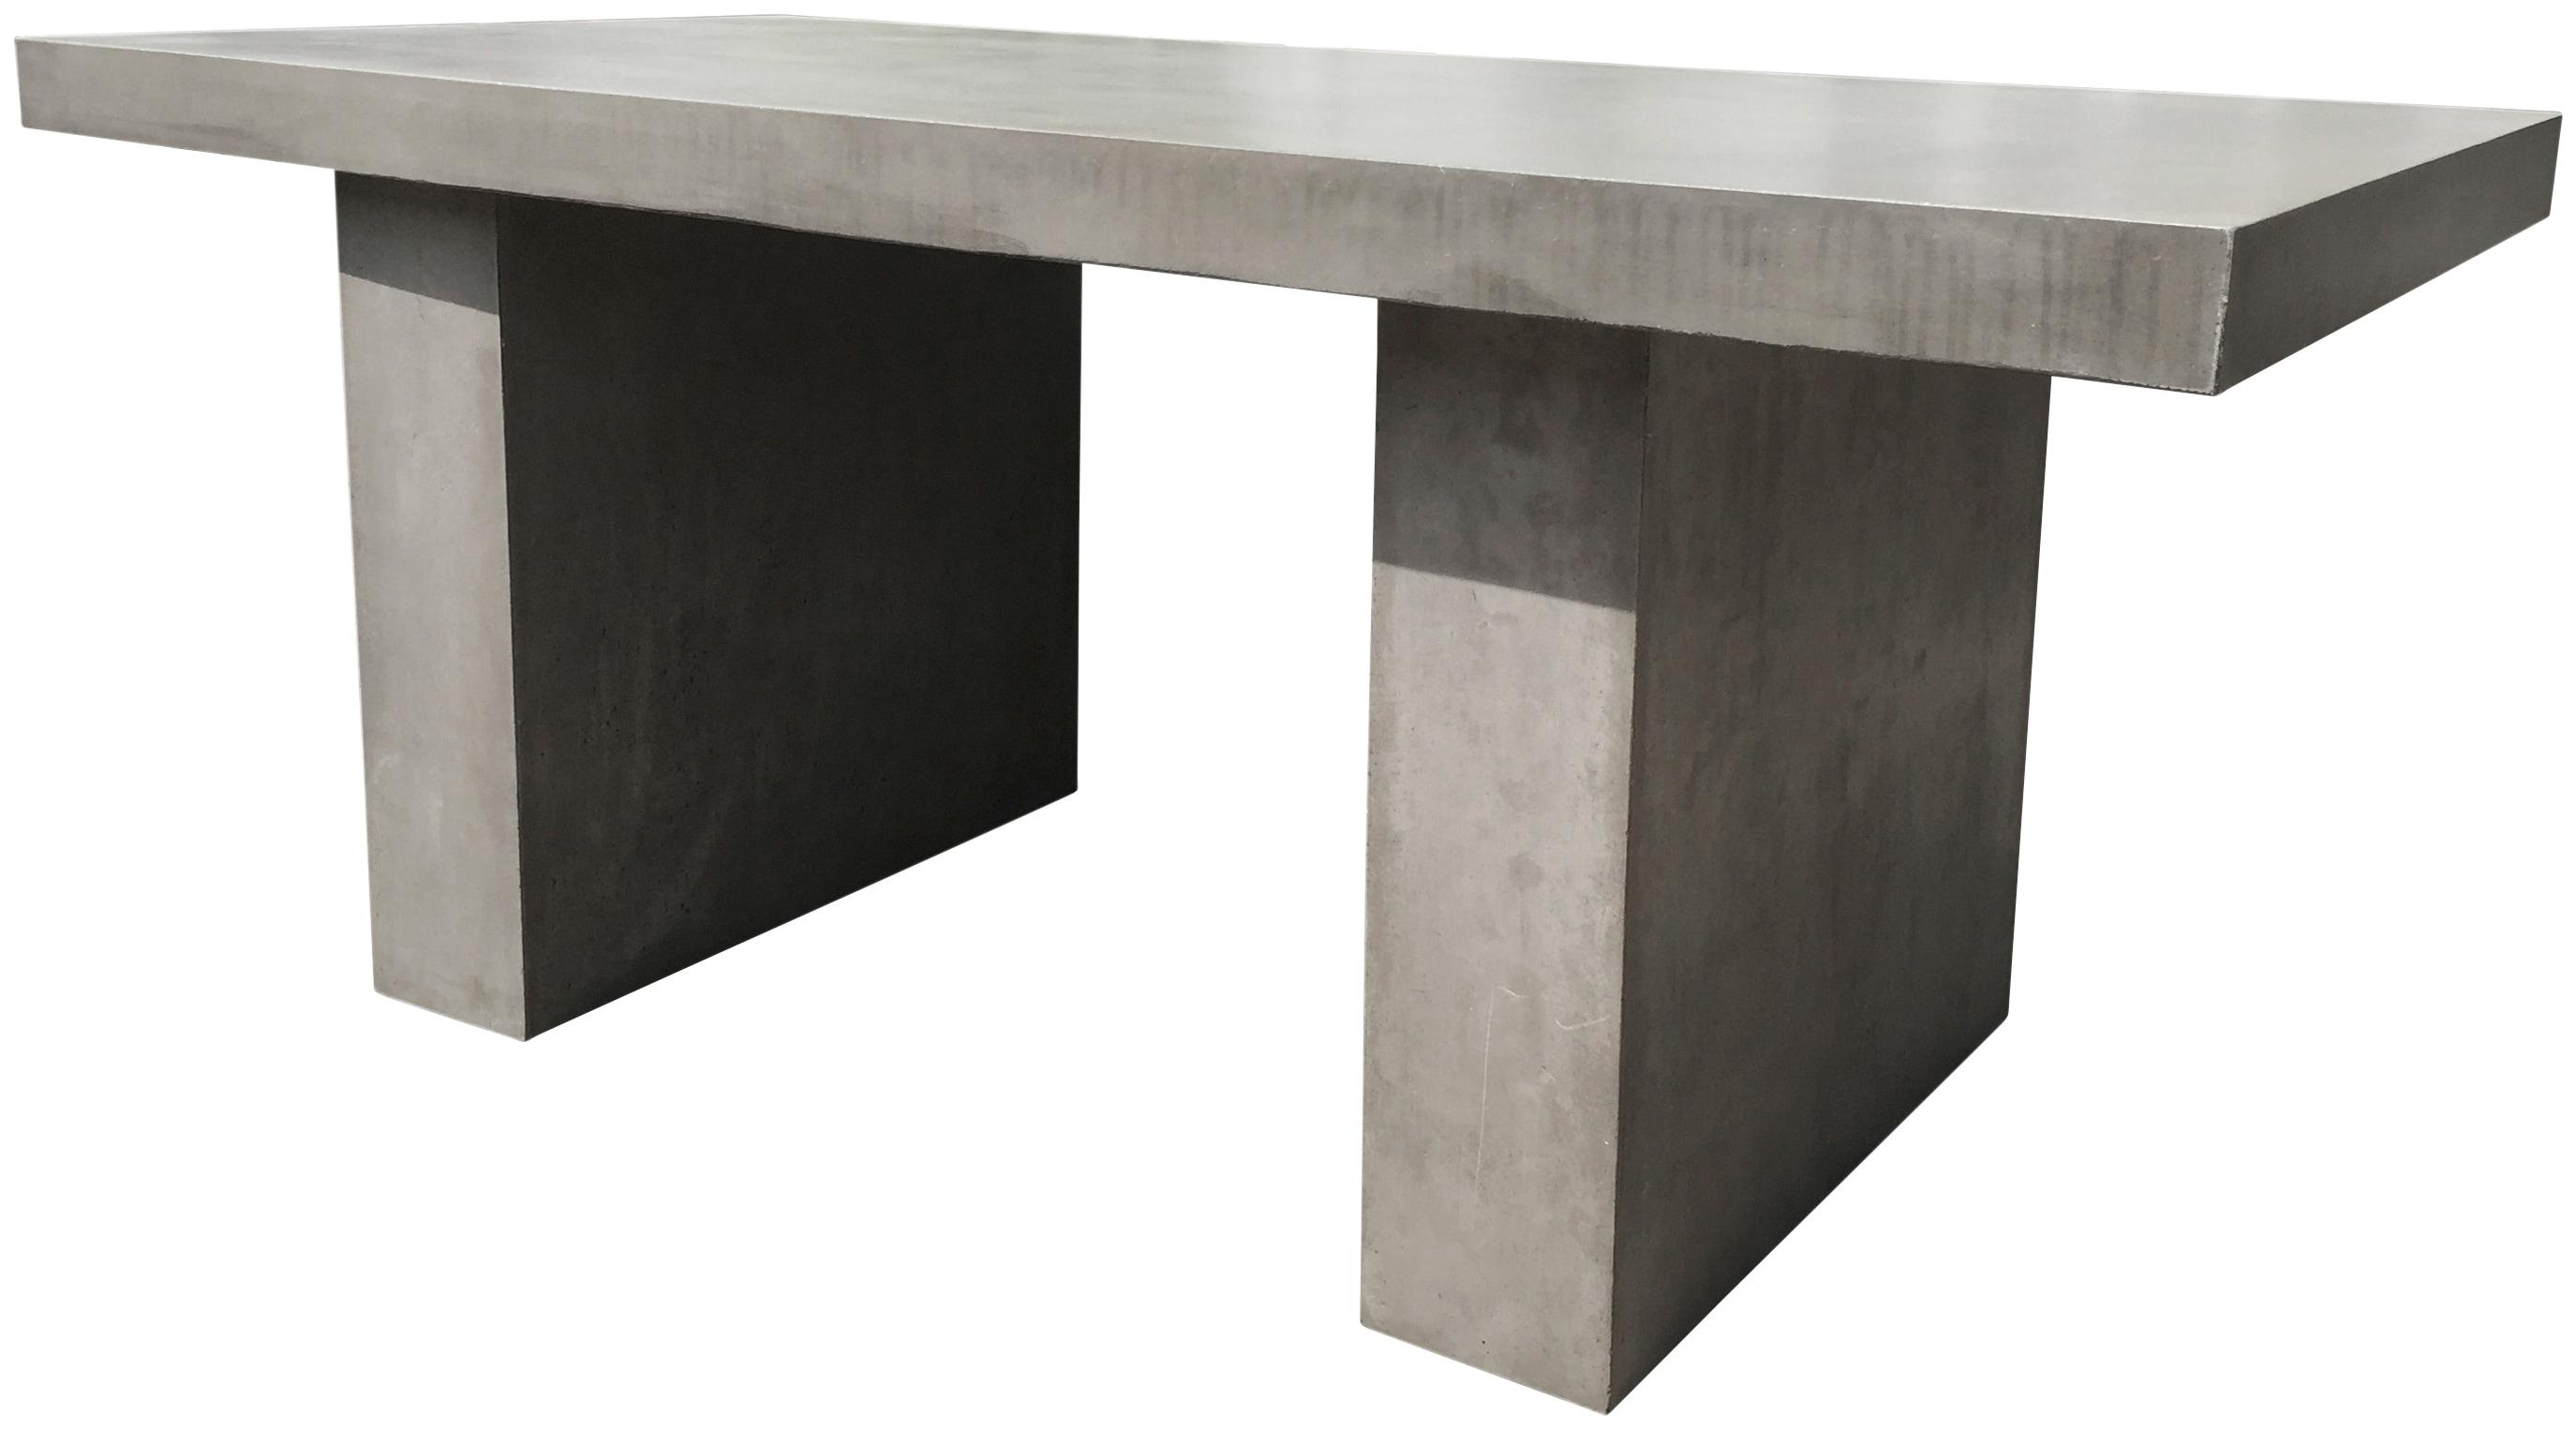 ANDIAMO Gartentisch Gravis 3-tlg Beton Maße (B/H/T) 90x76x180 cm